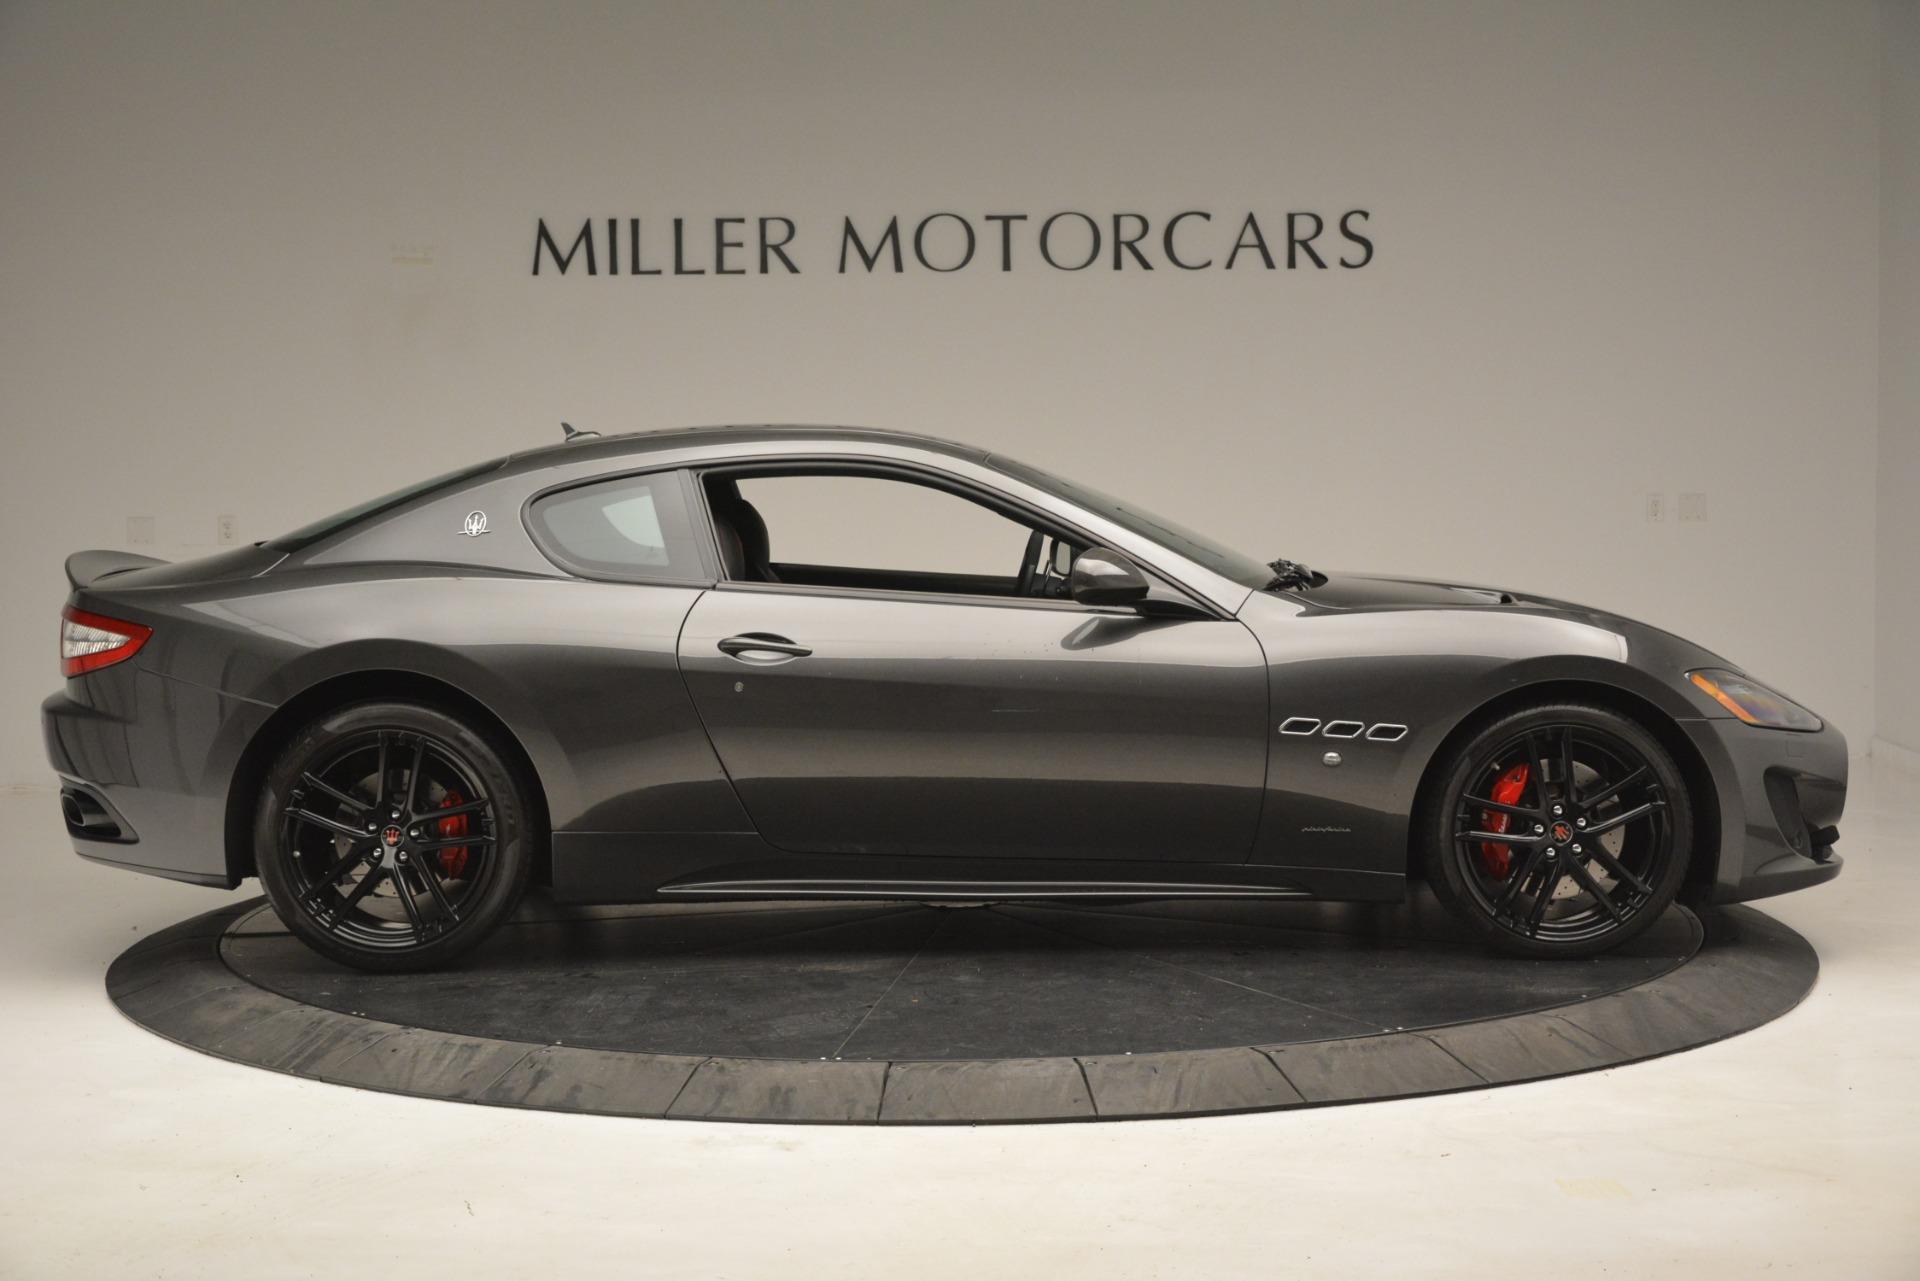 Used 2017 Maserati GranTurismo GT Sport Special Edition For Sale In Greenwich, CT 665_p9